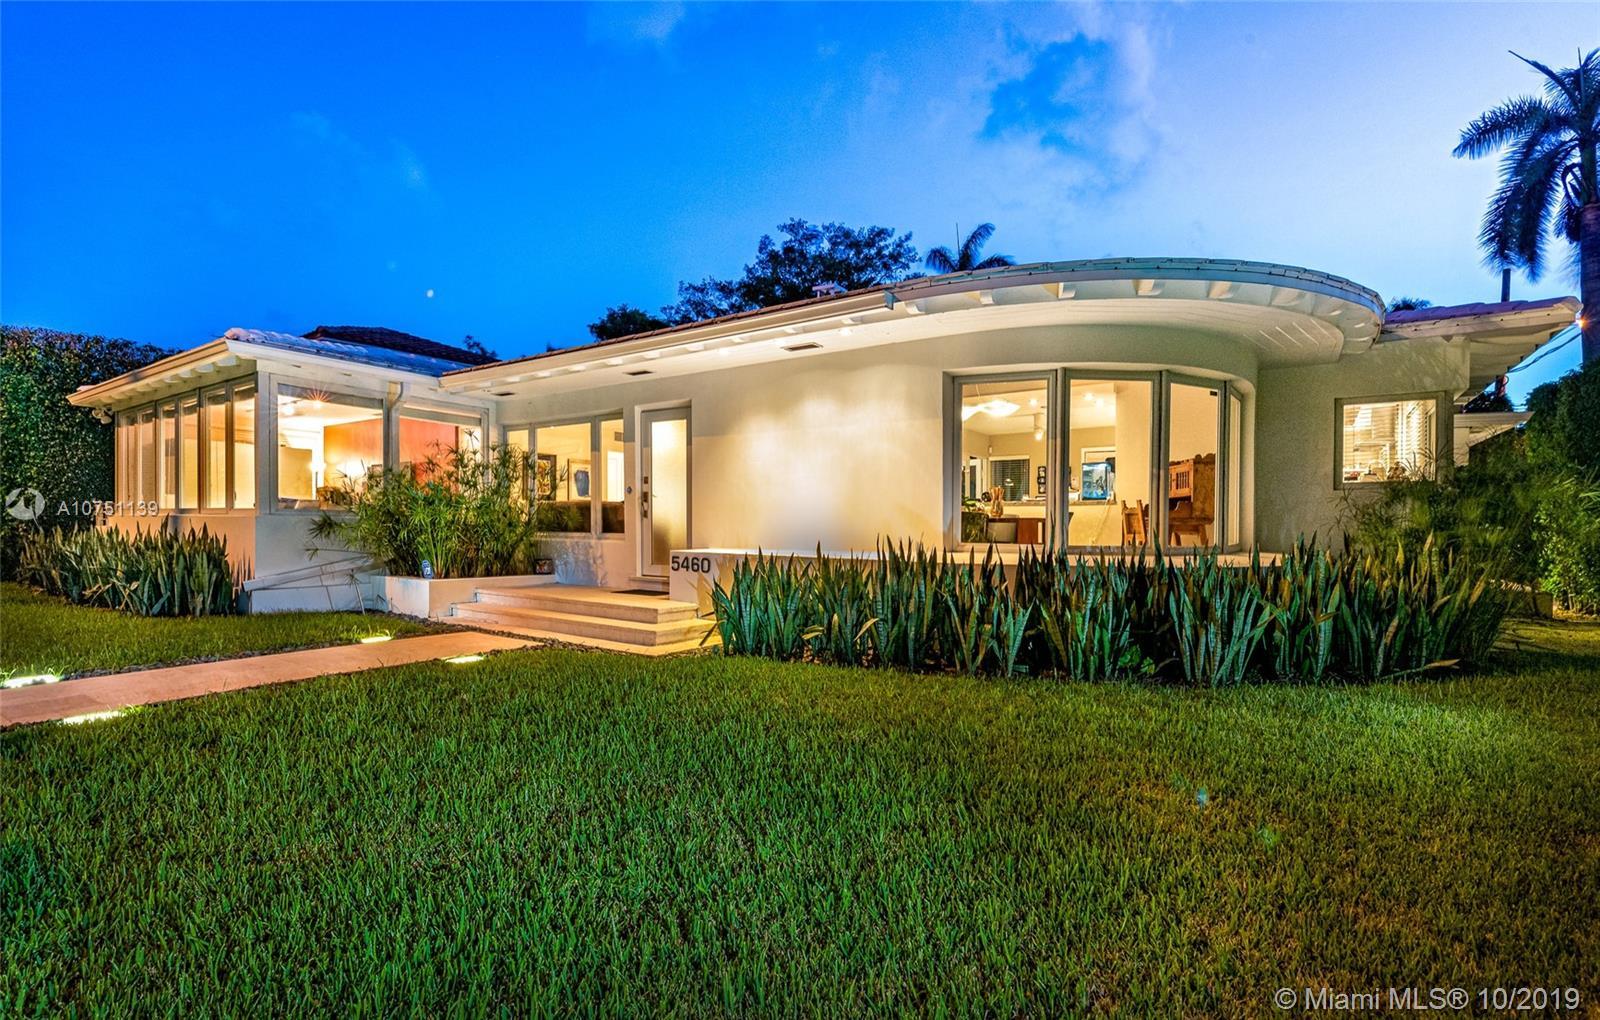 5460 Alton Rd, Miami Beach, FL 33140